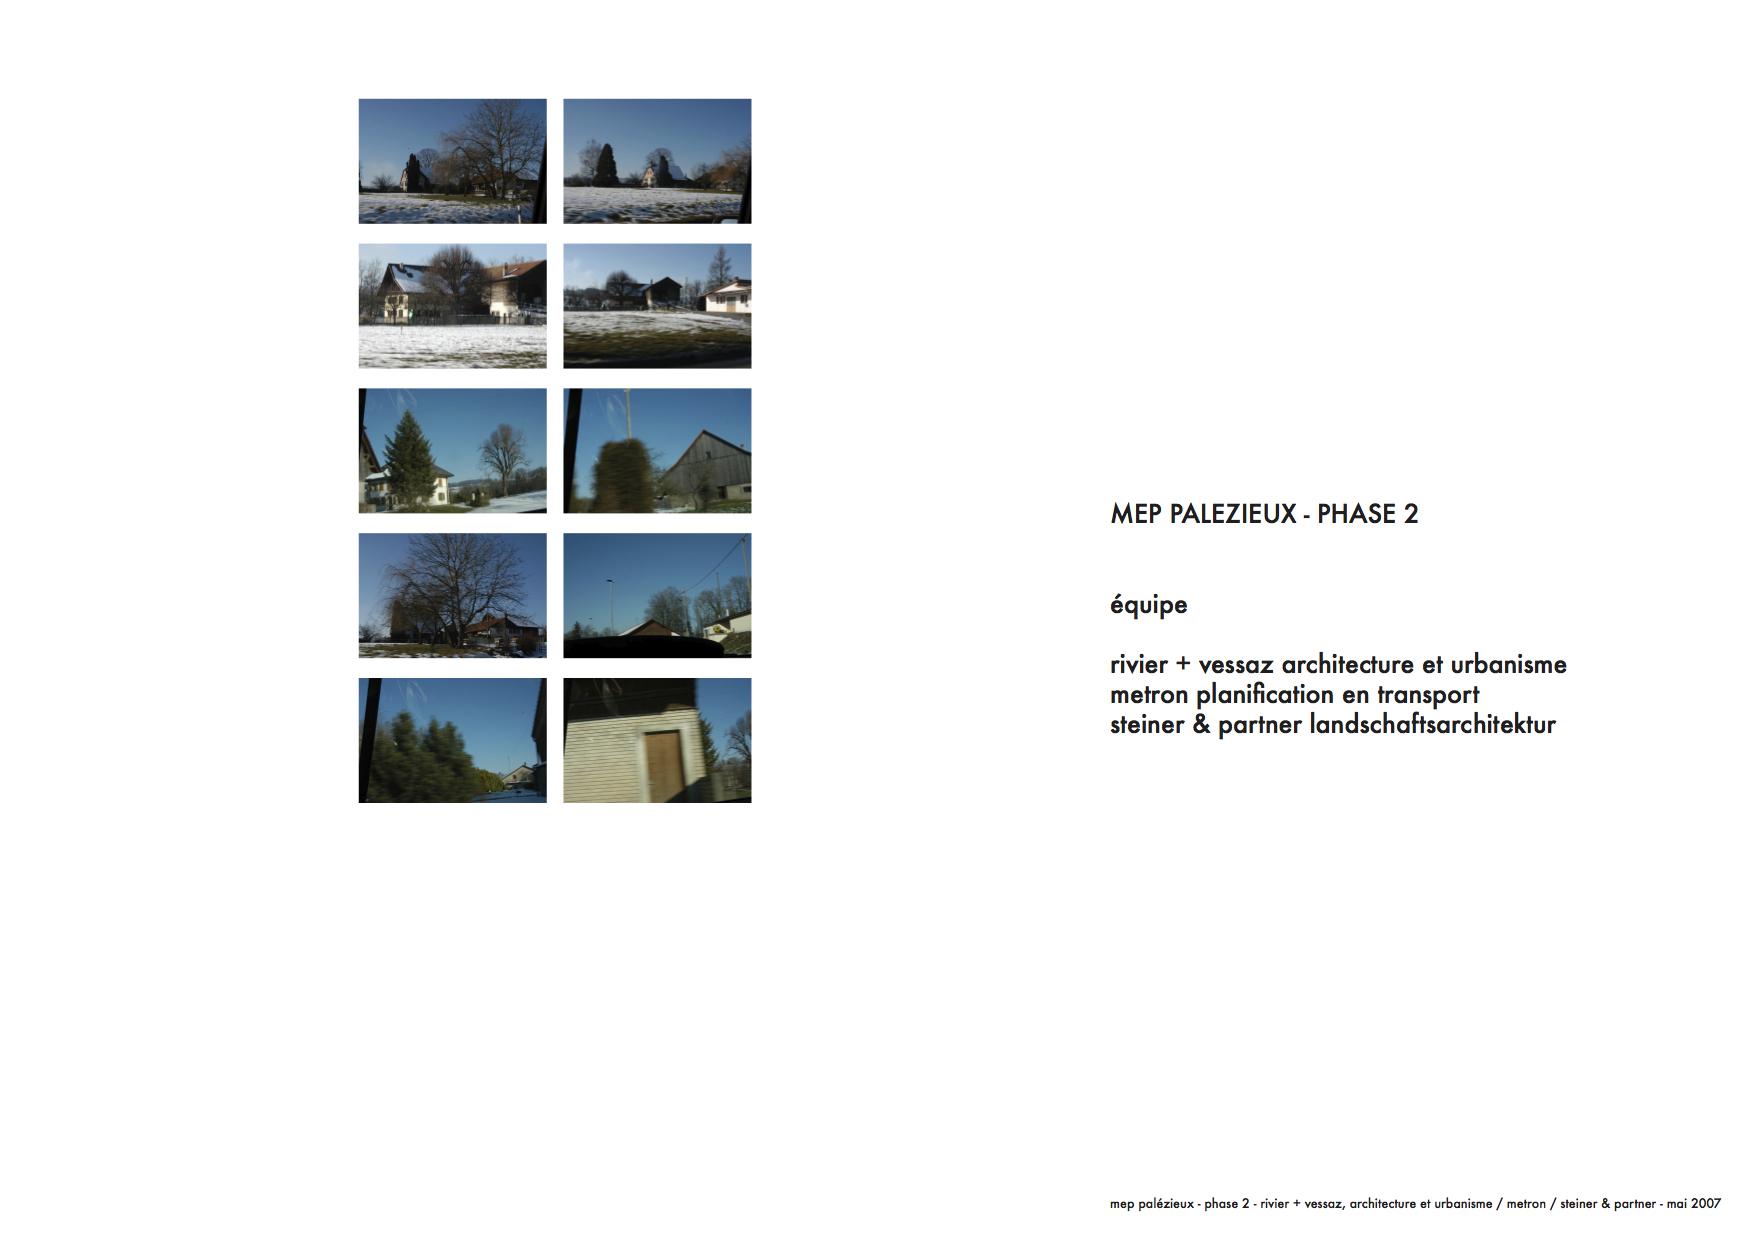 00 PAL_rendu_phase_2_A4_DEF_01